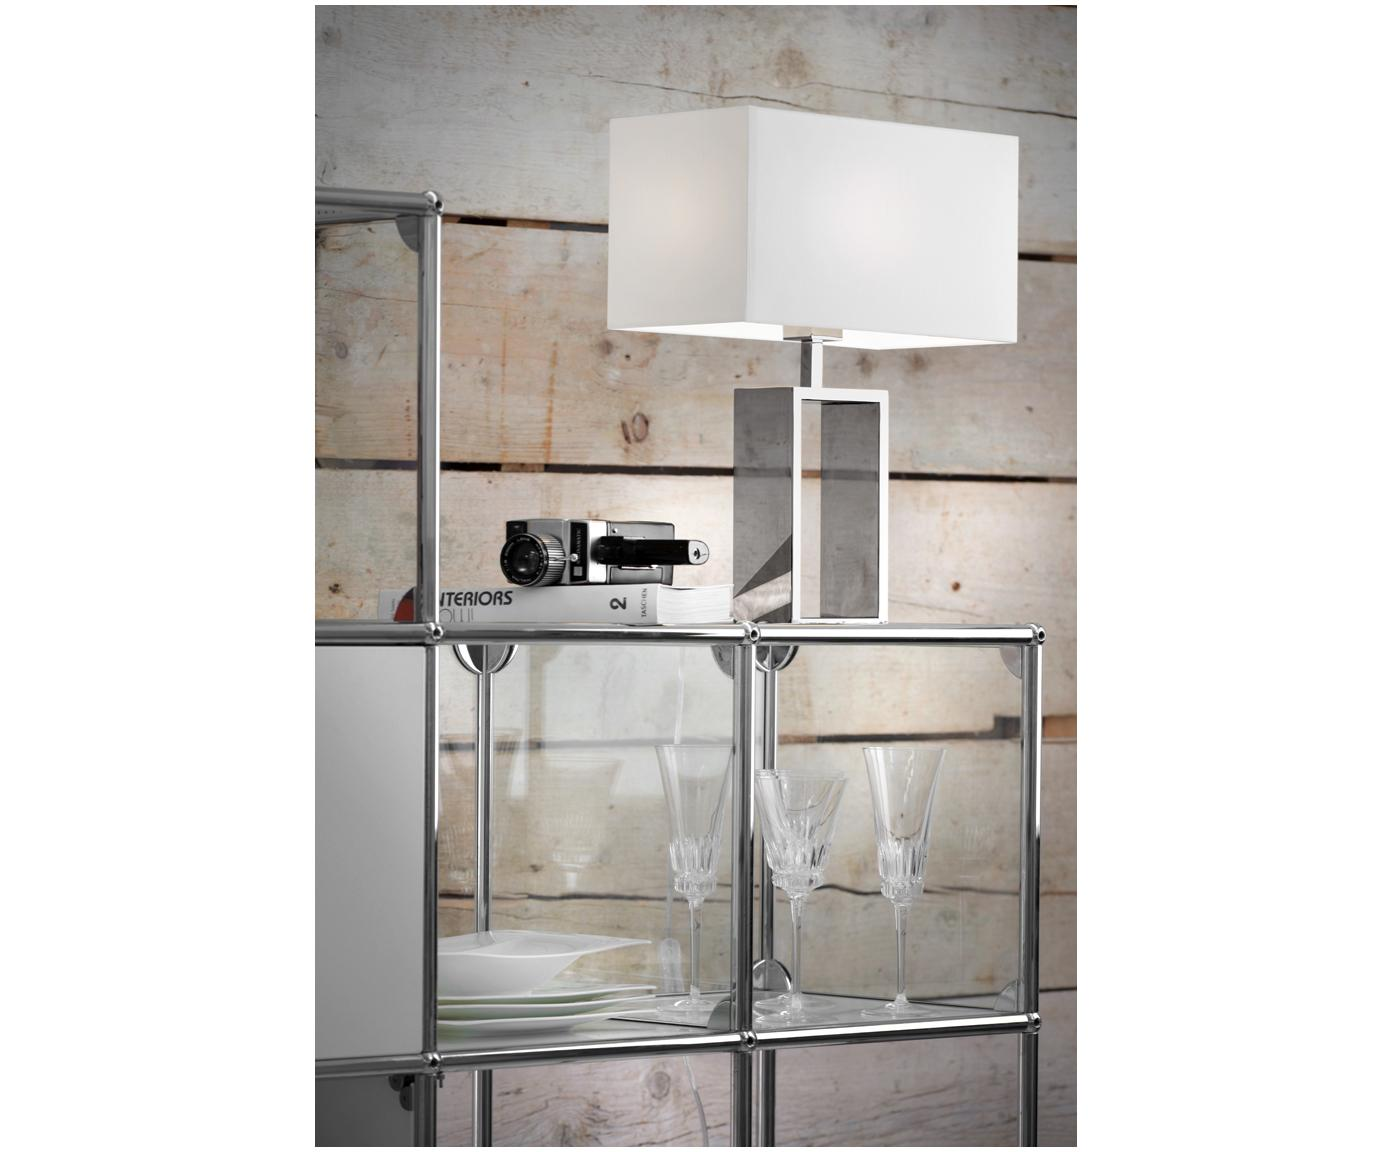 Lampada da tavolo in cromo Shanghai, Base della lampada: acciaio inossidabile crom, Cromo, bianco, Larg. 35 x Alt. 47 cm